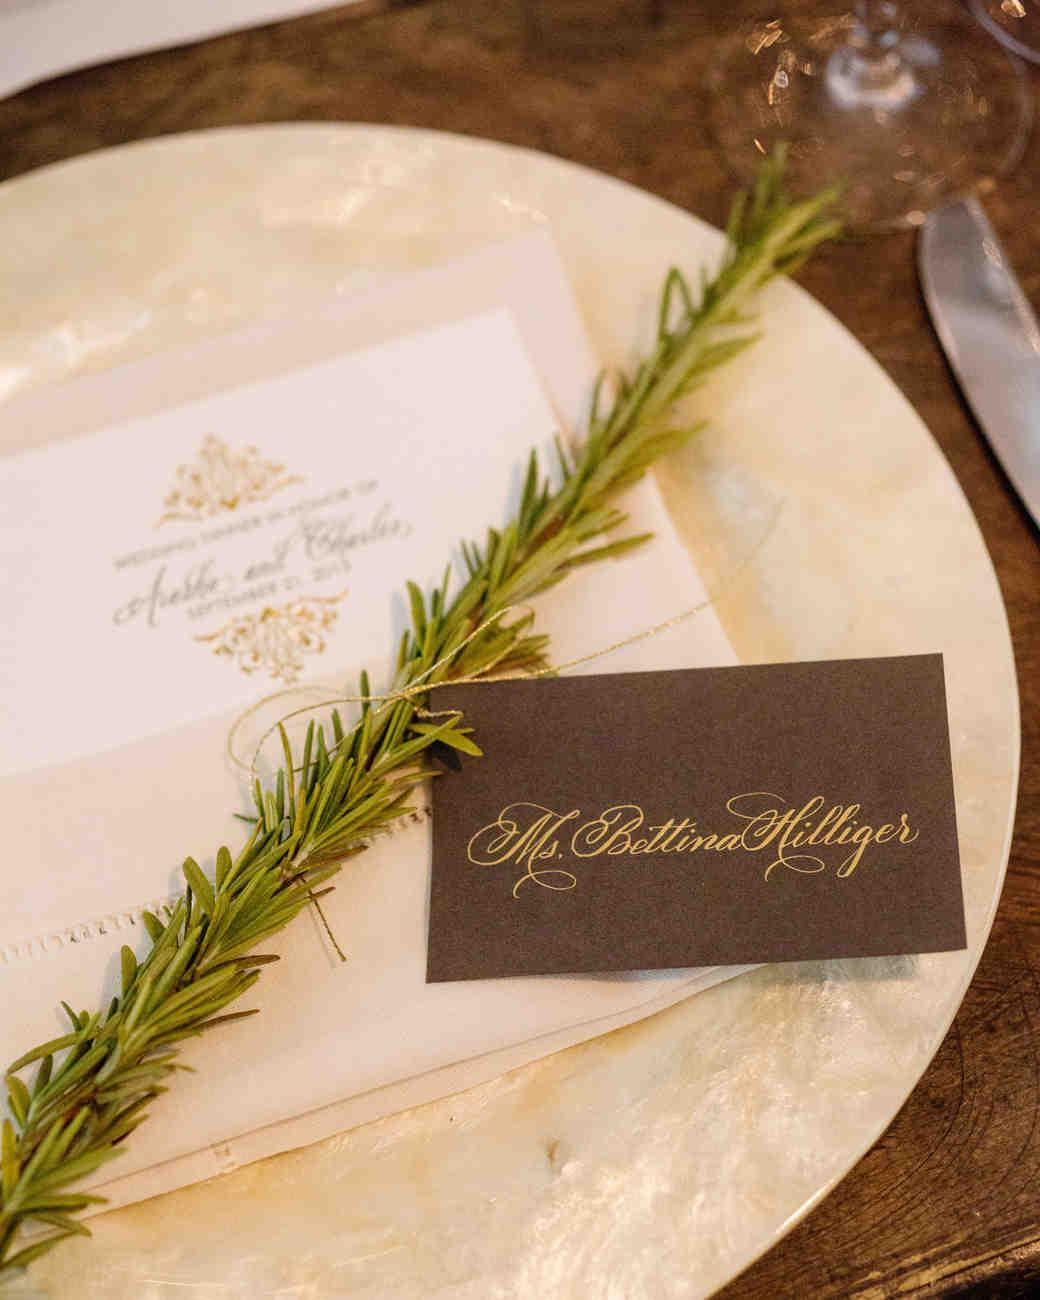 aiasha-charles-wedding-placesetting-0514.jpg